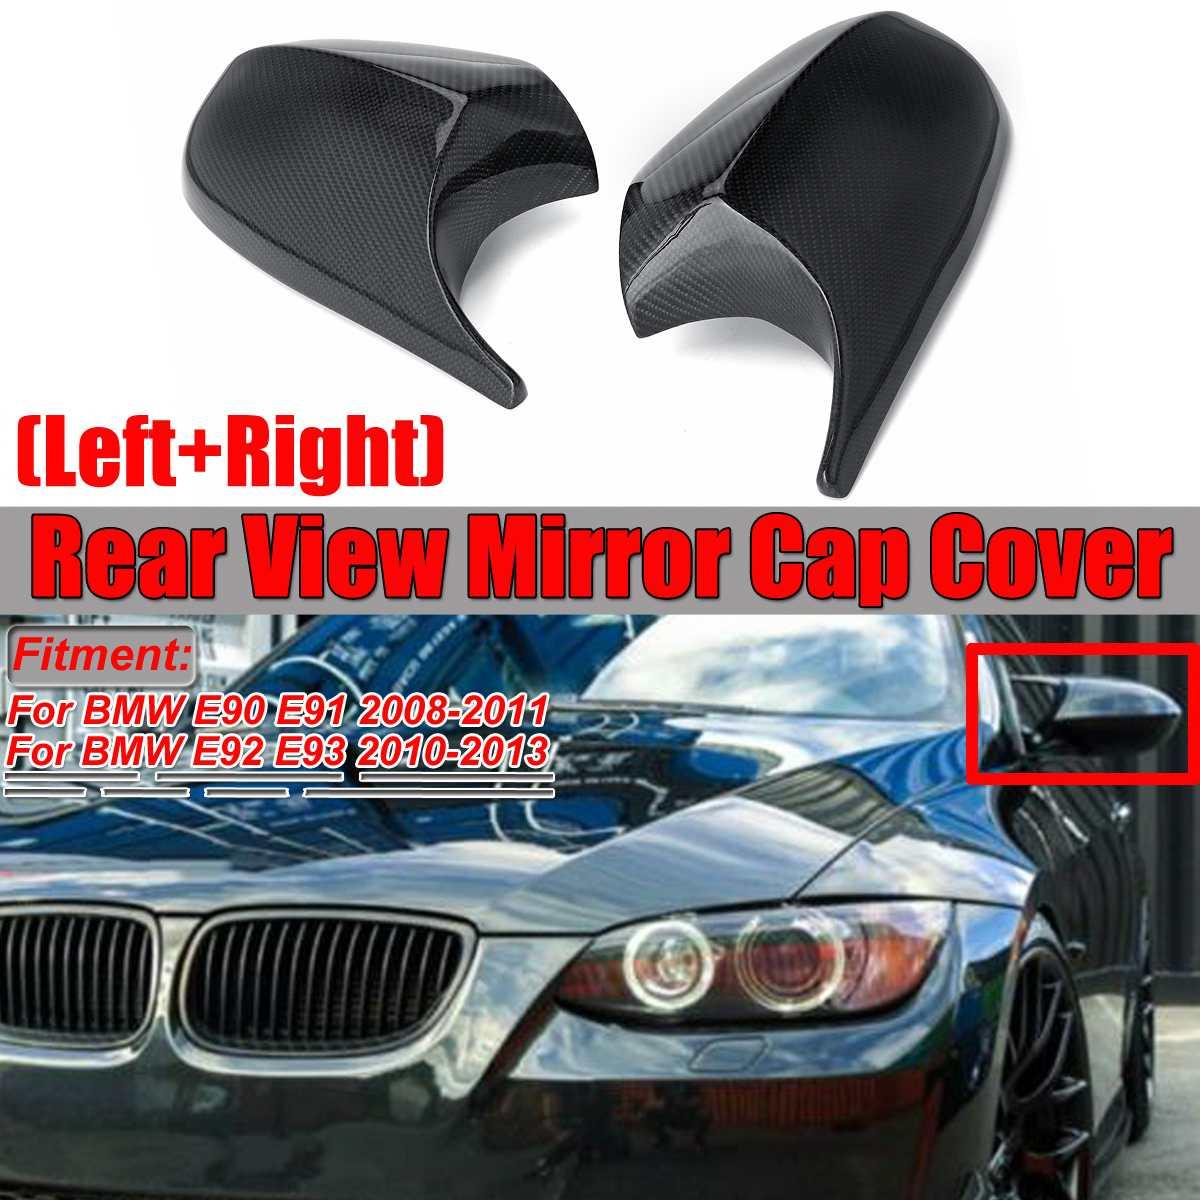 2 Stuks Real Carbon Fiber/Abs Spiegel Cover E90 Auto Achteruitkijkspiegel Cap Cover Direct Vervangen Voor Bmw E90 e91 08-11 E92 E93 10-13 Lci